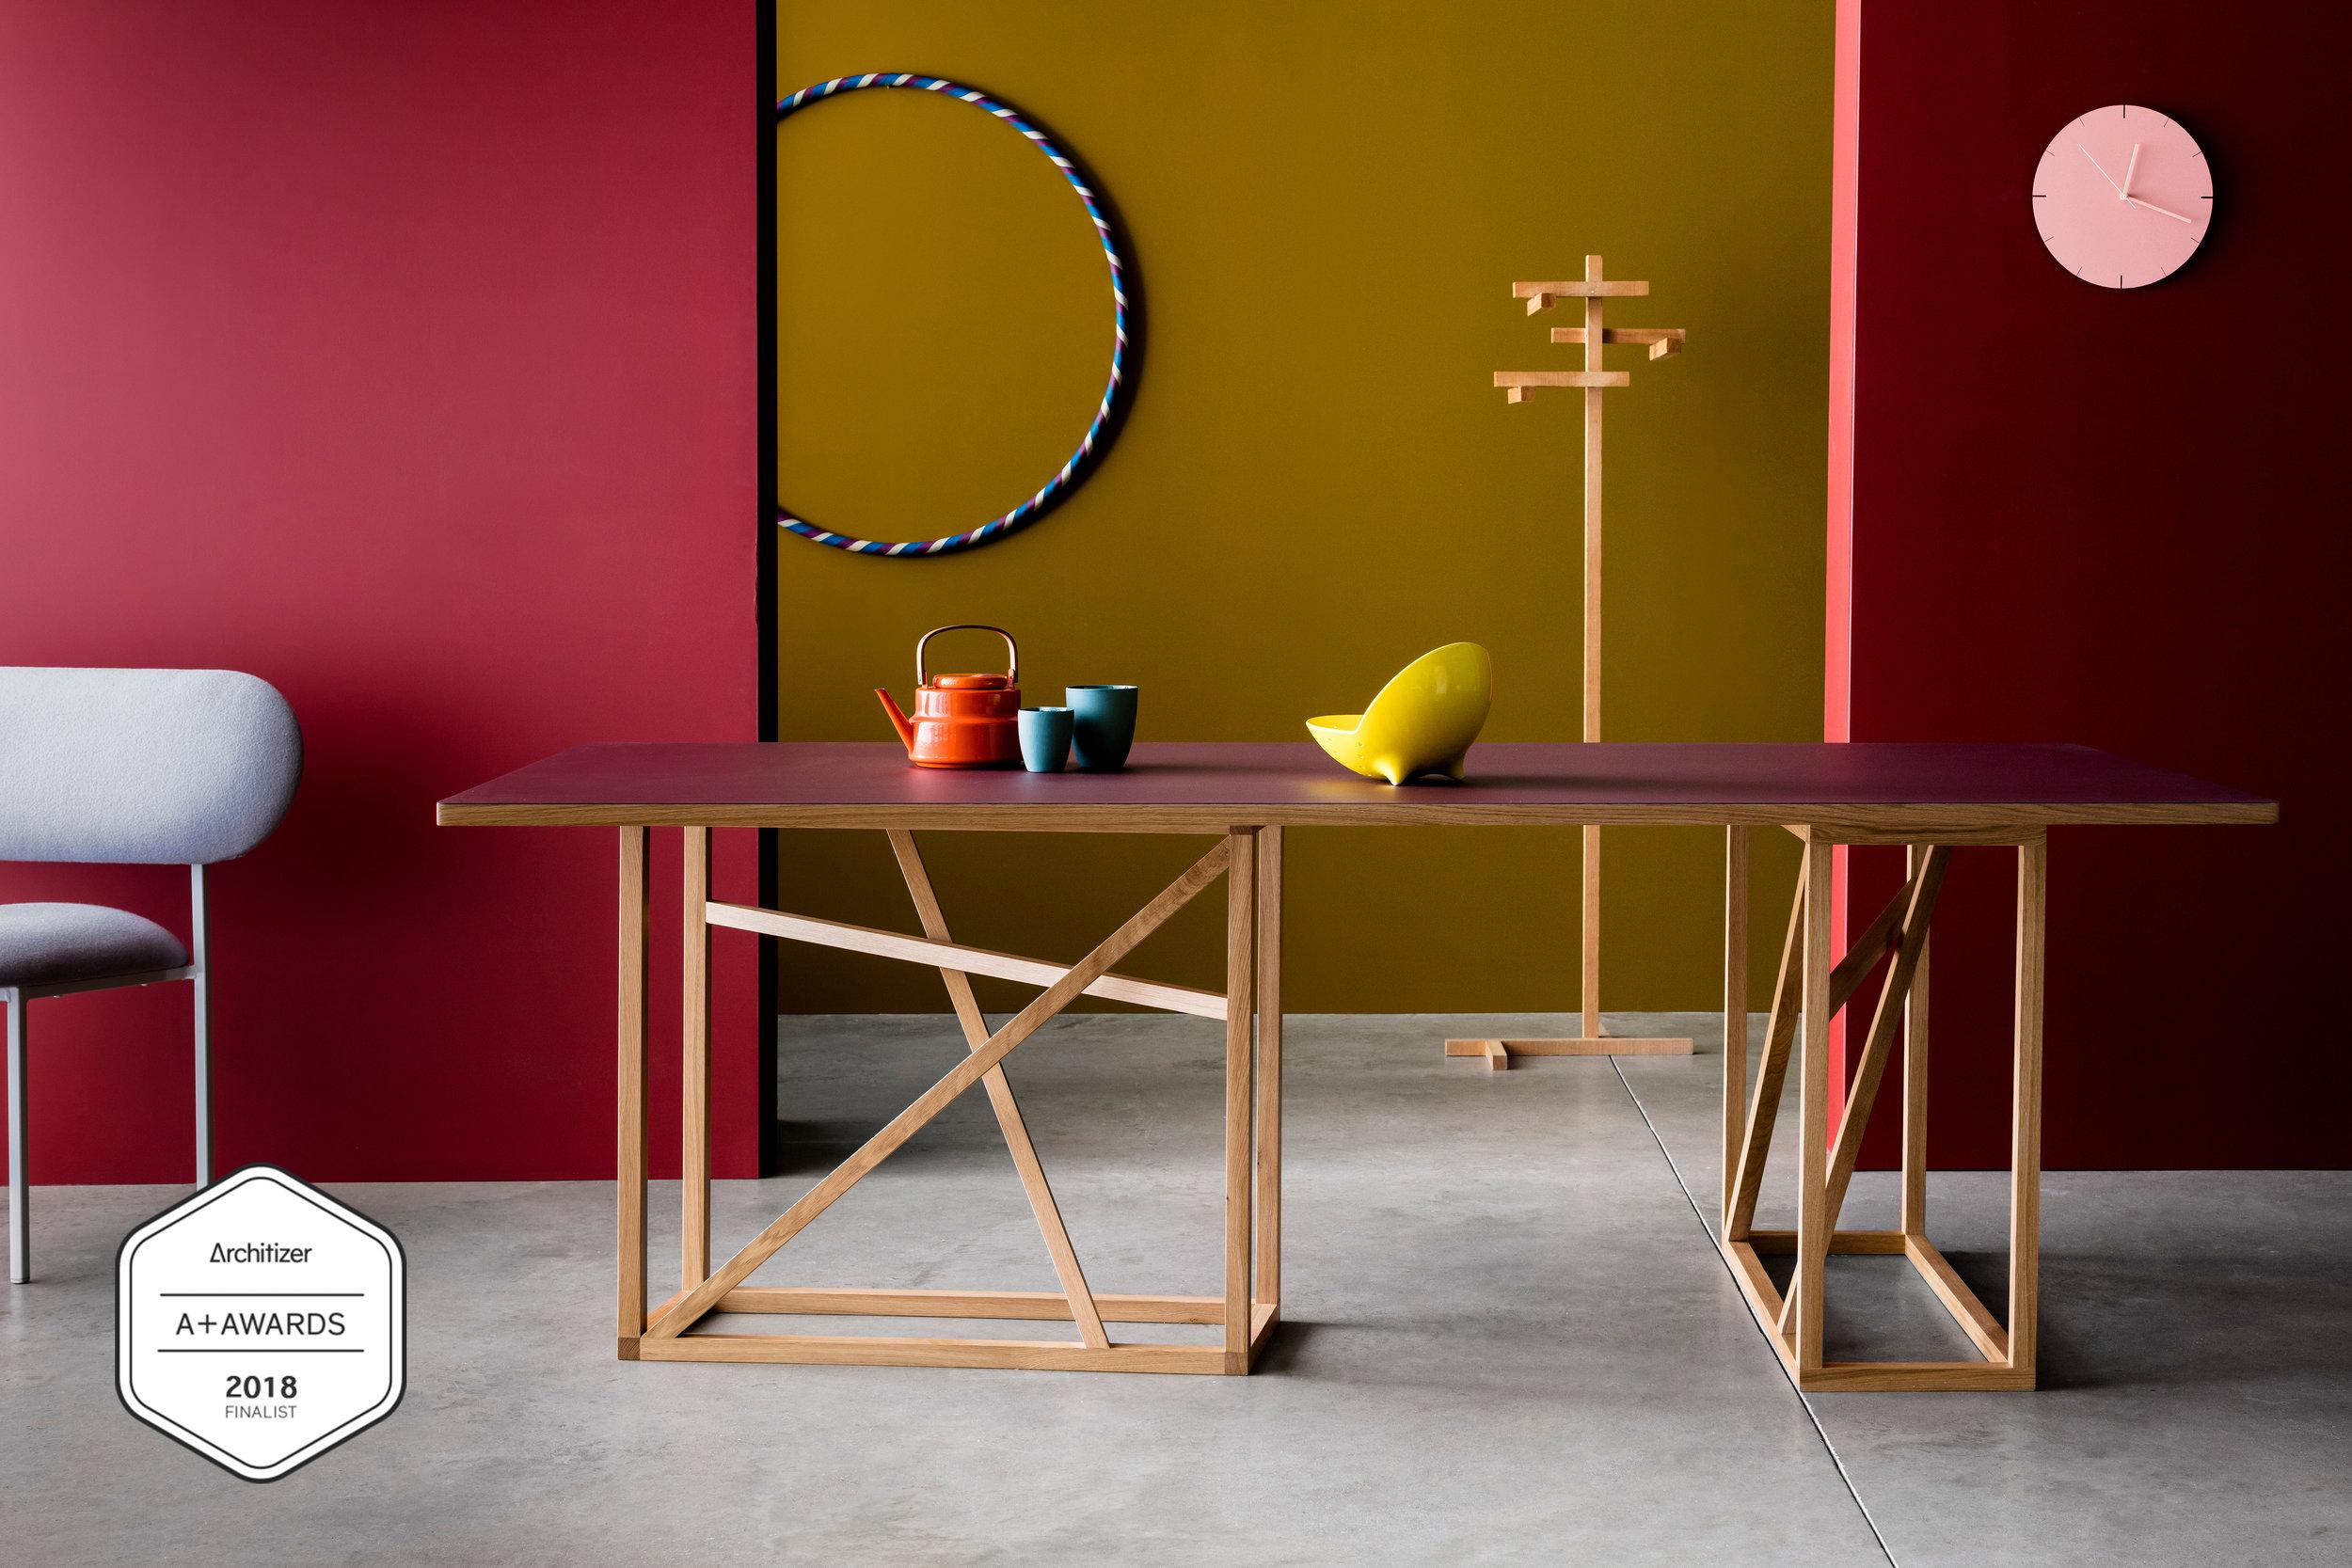 Another-Brand-Studiomama-1x1-Trestle-Table-Furniture-Award.jpg